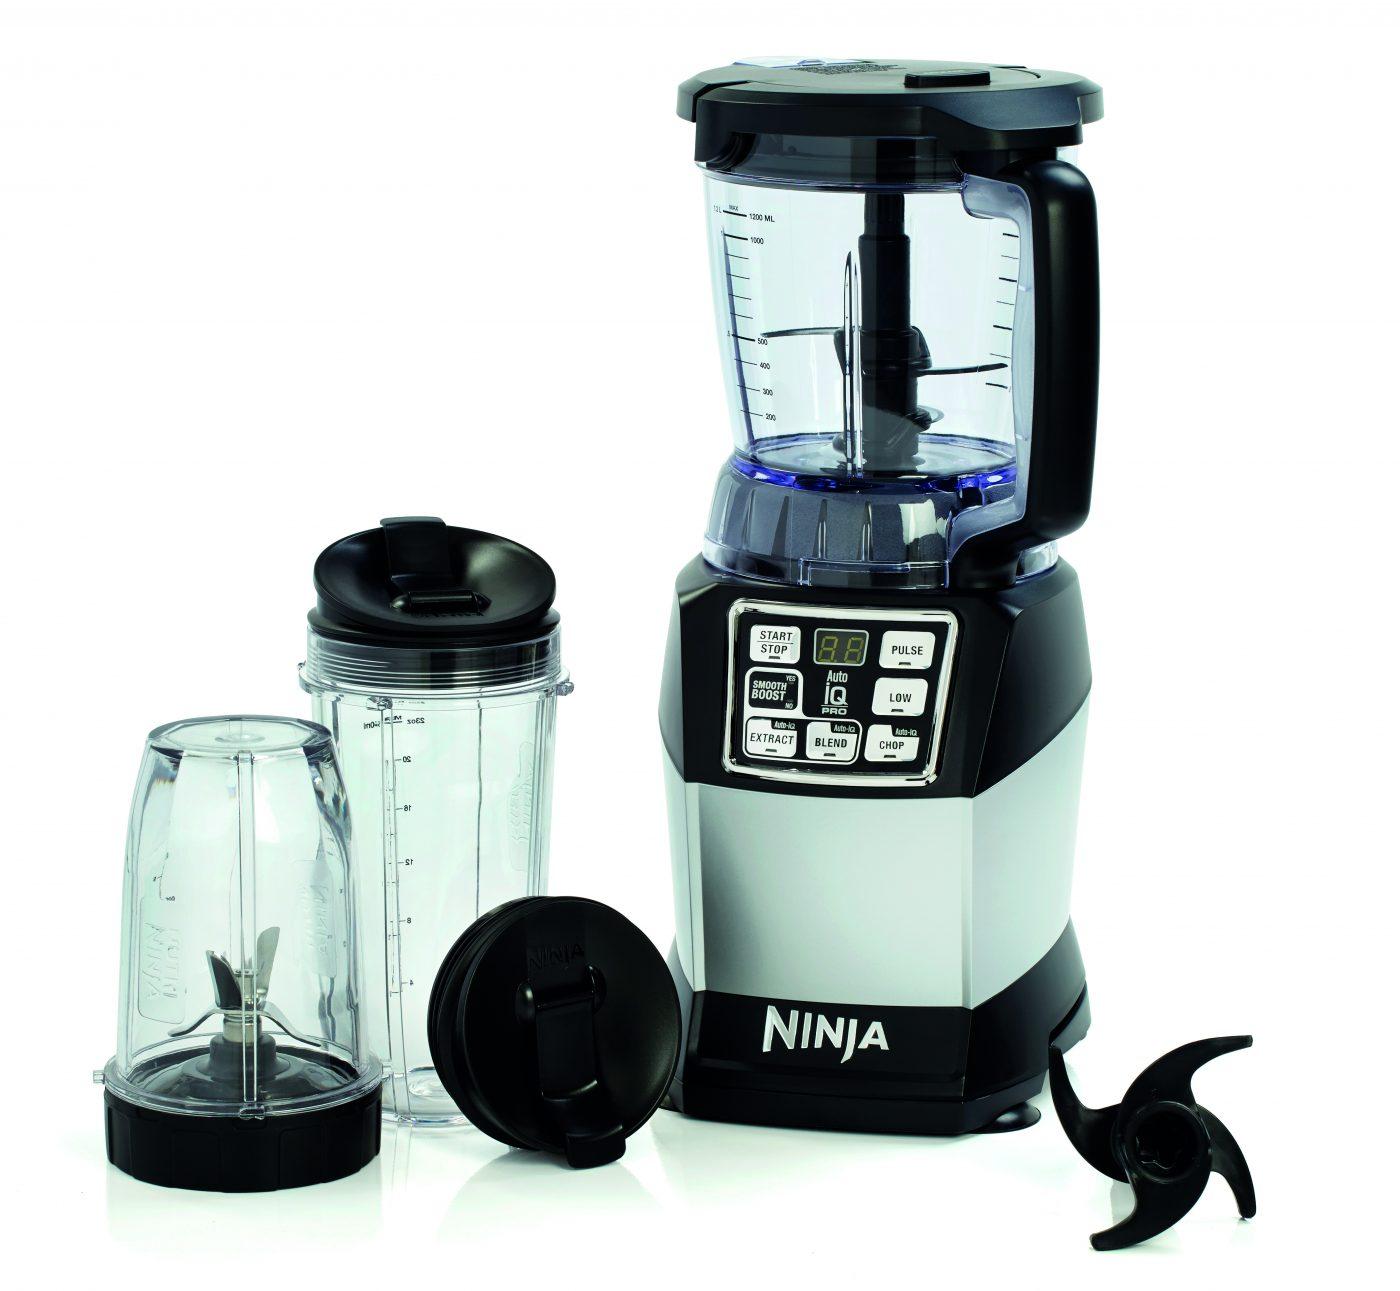 Ninja Compact Food Processor with Auto-iQ and Nutri Ninja 1200W – BL490UK